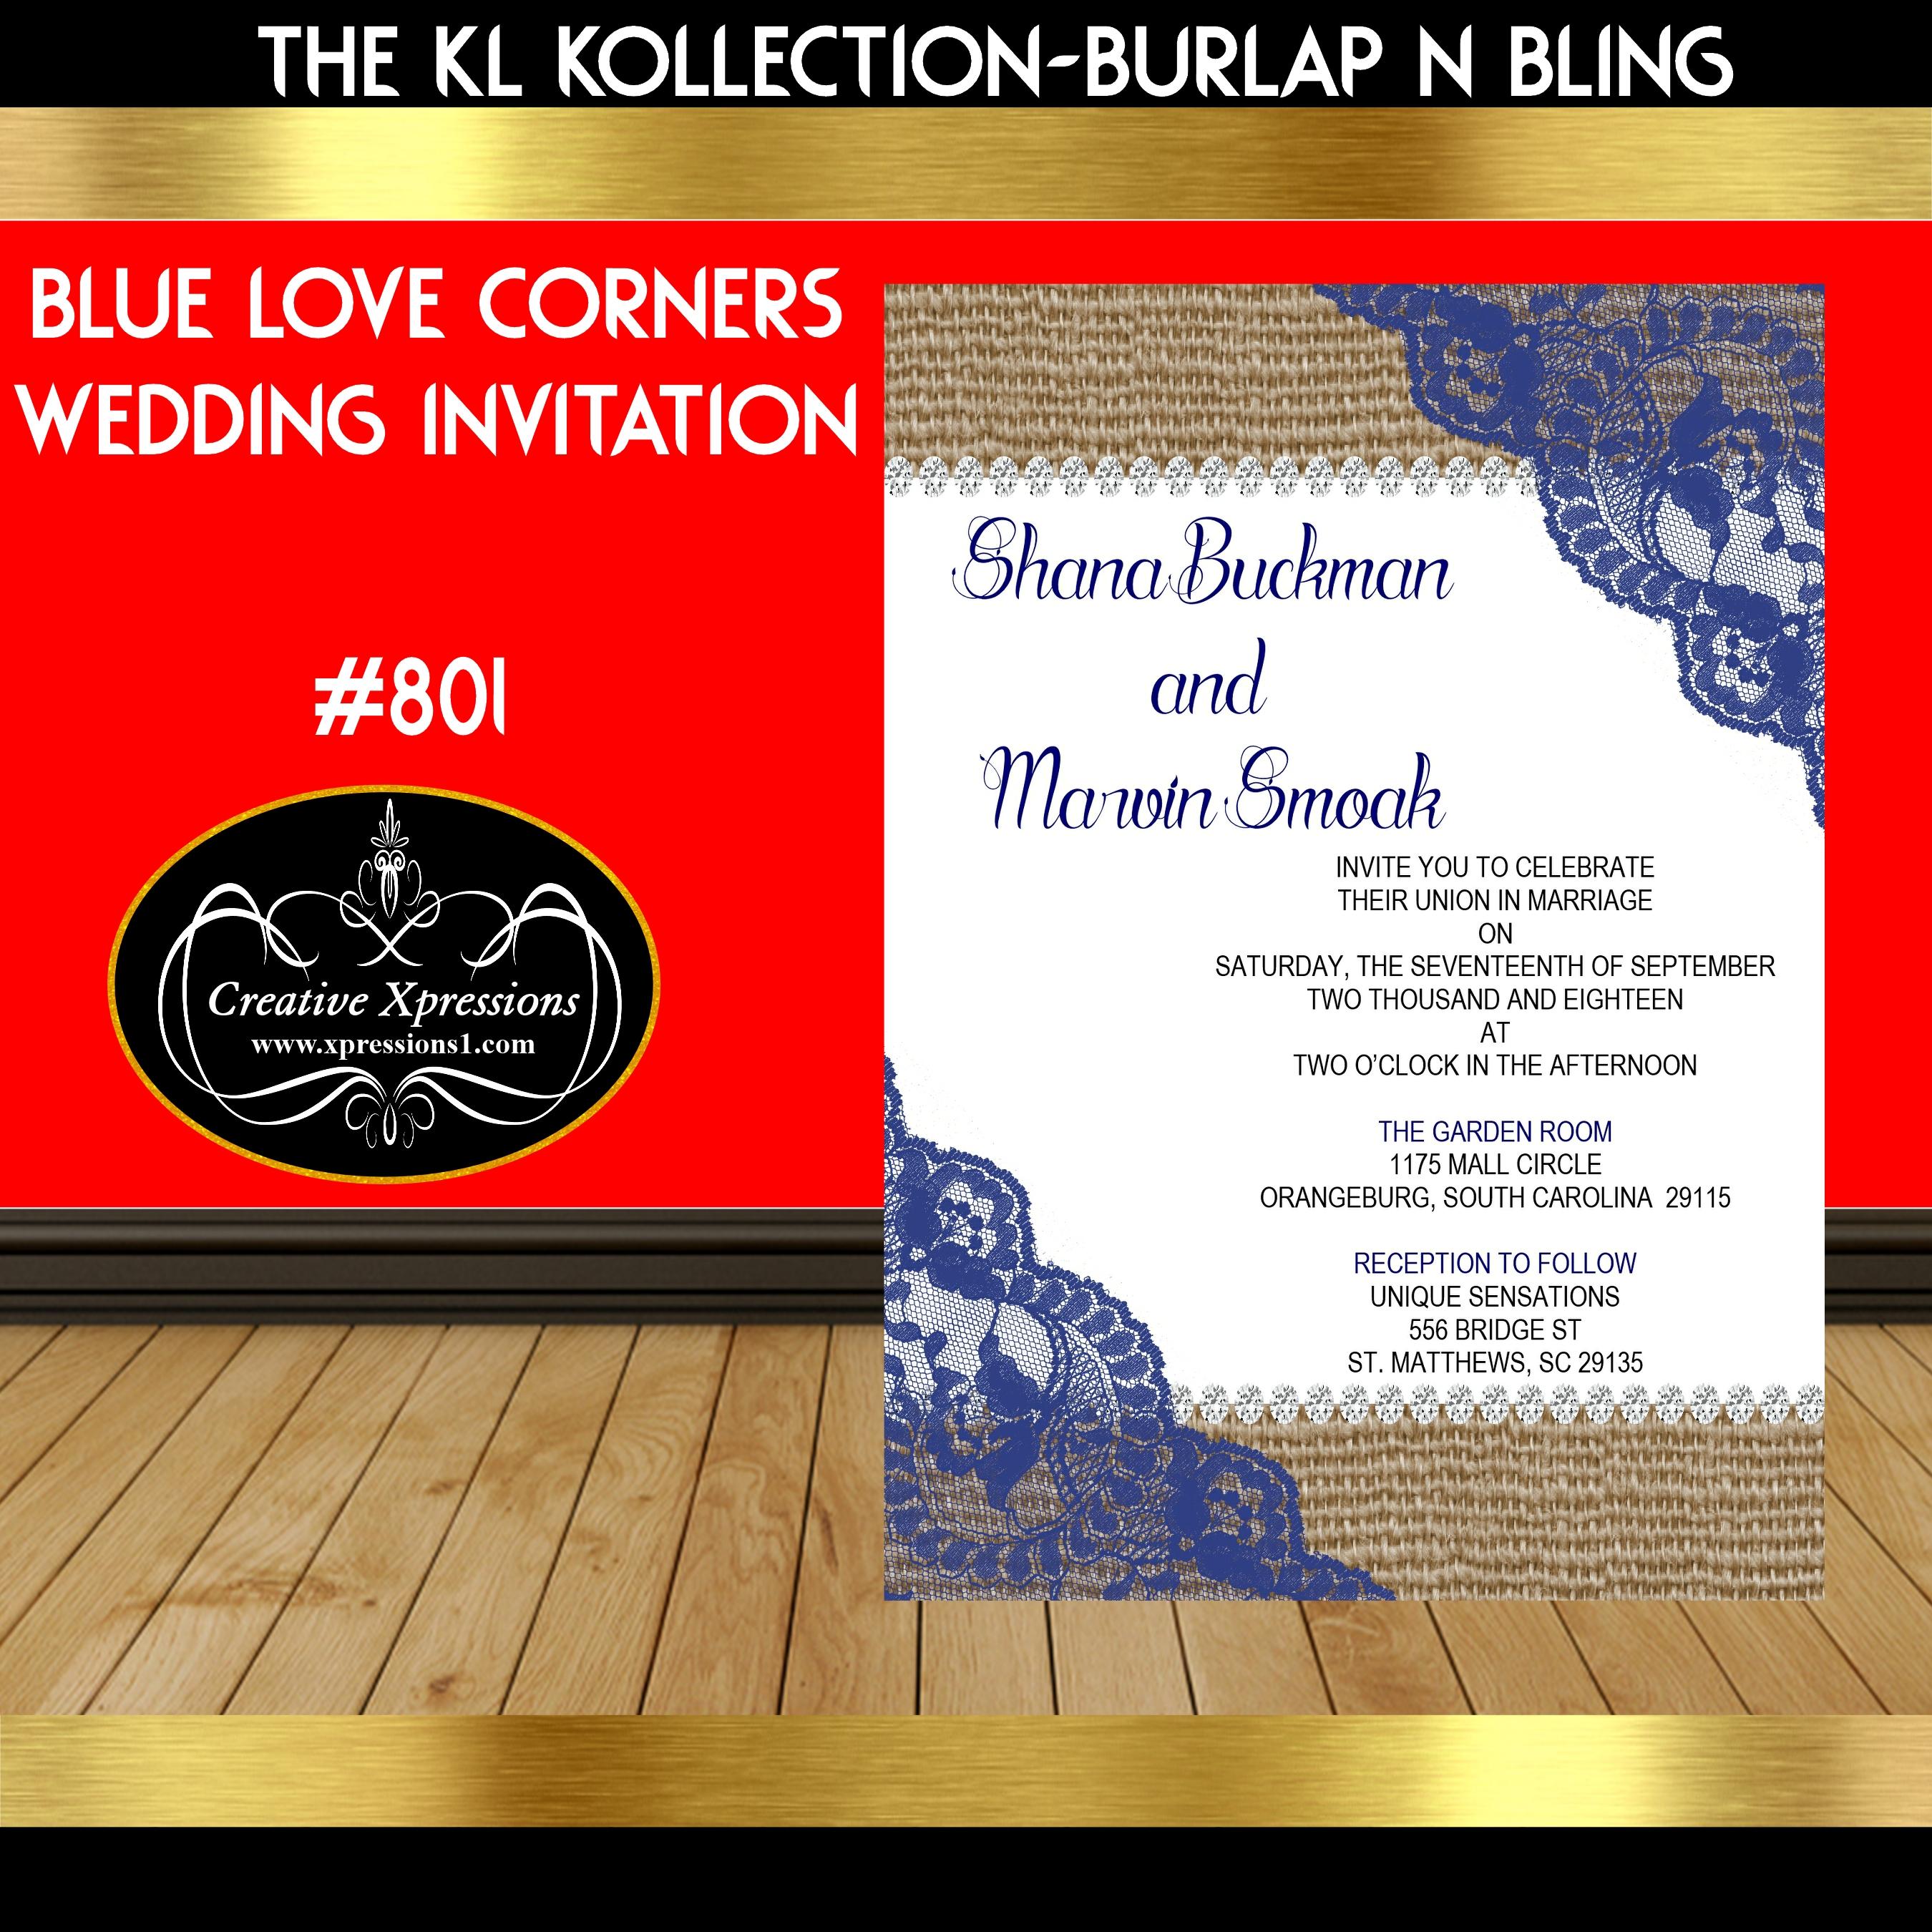 Blue Love Corners Wedding Invitation